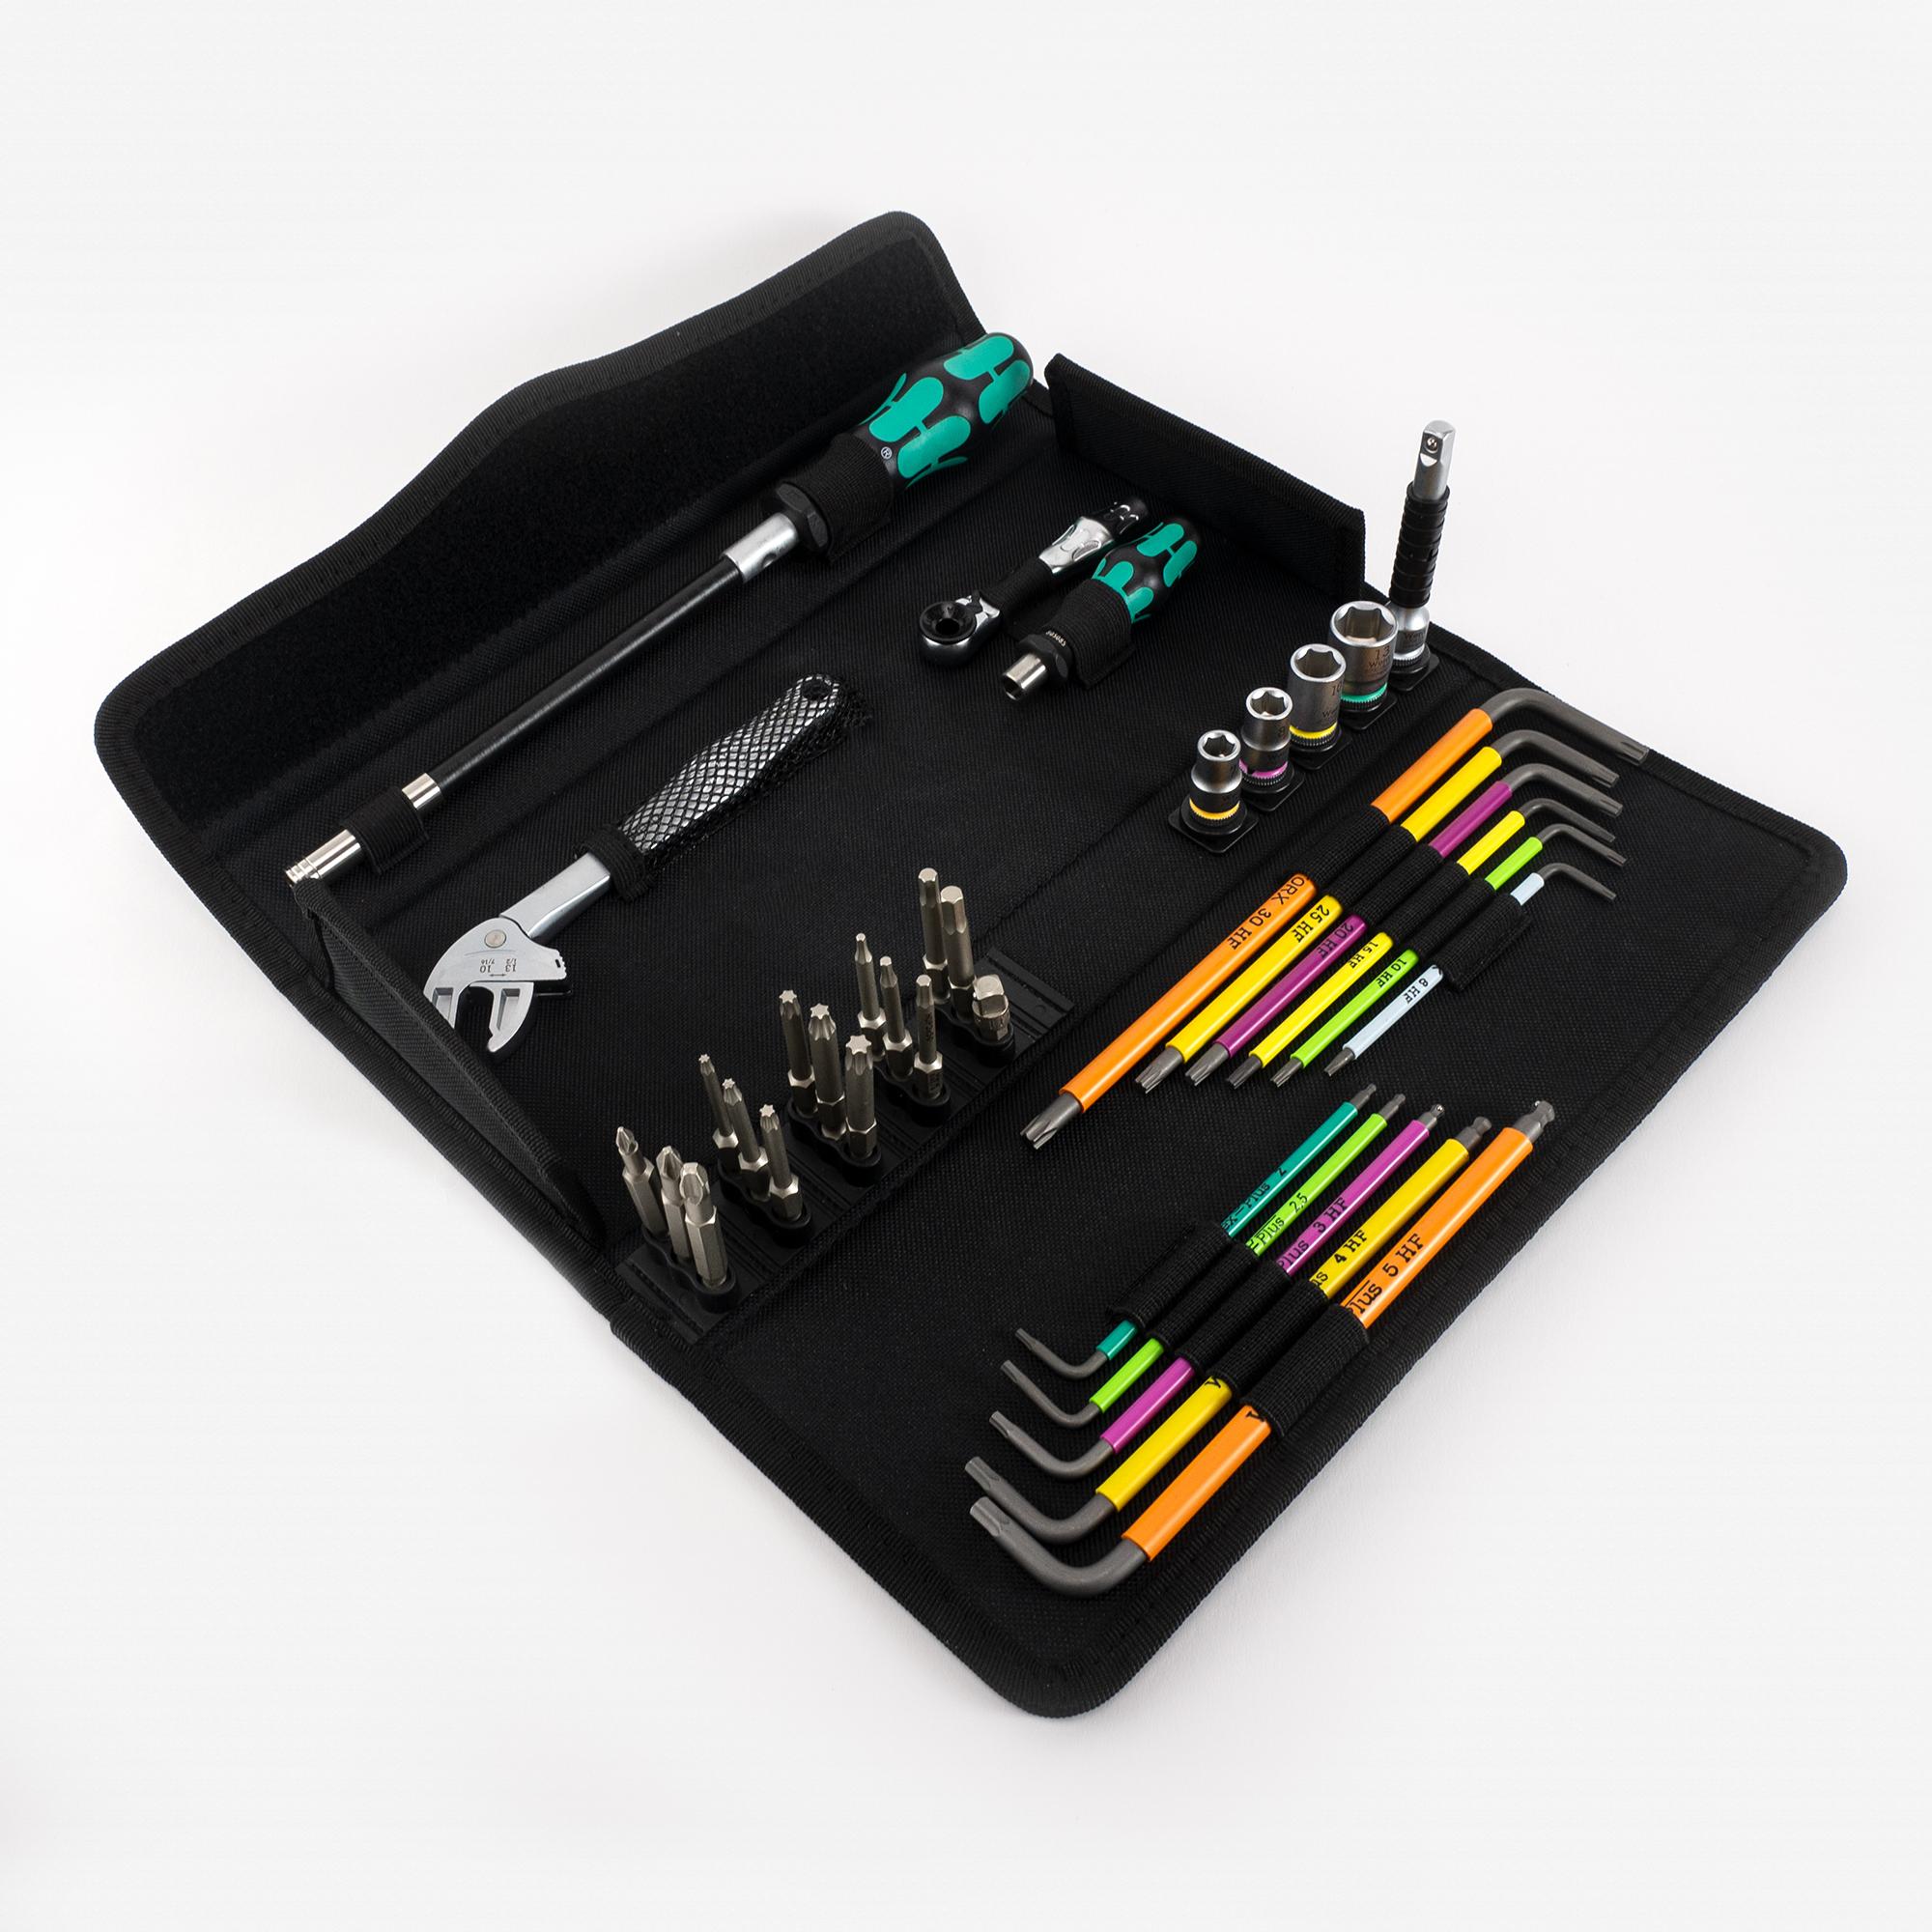 Wera 134013 Kraftform Kompakt F 1 Tool Set for Window Installation, 35 Pieces - KC Tool